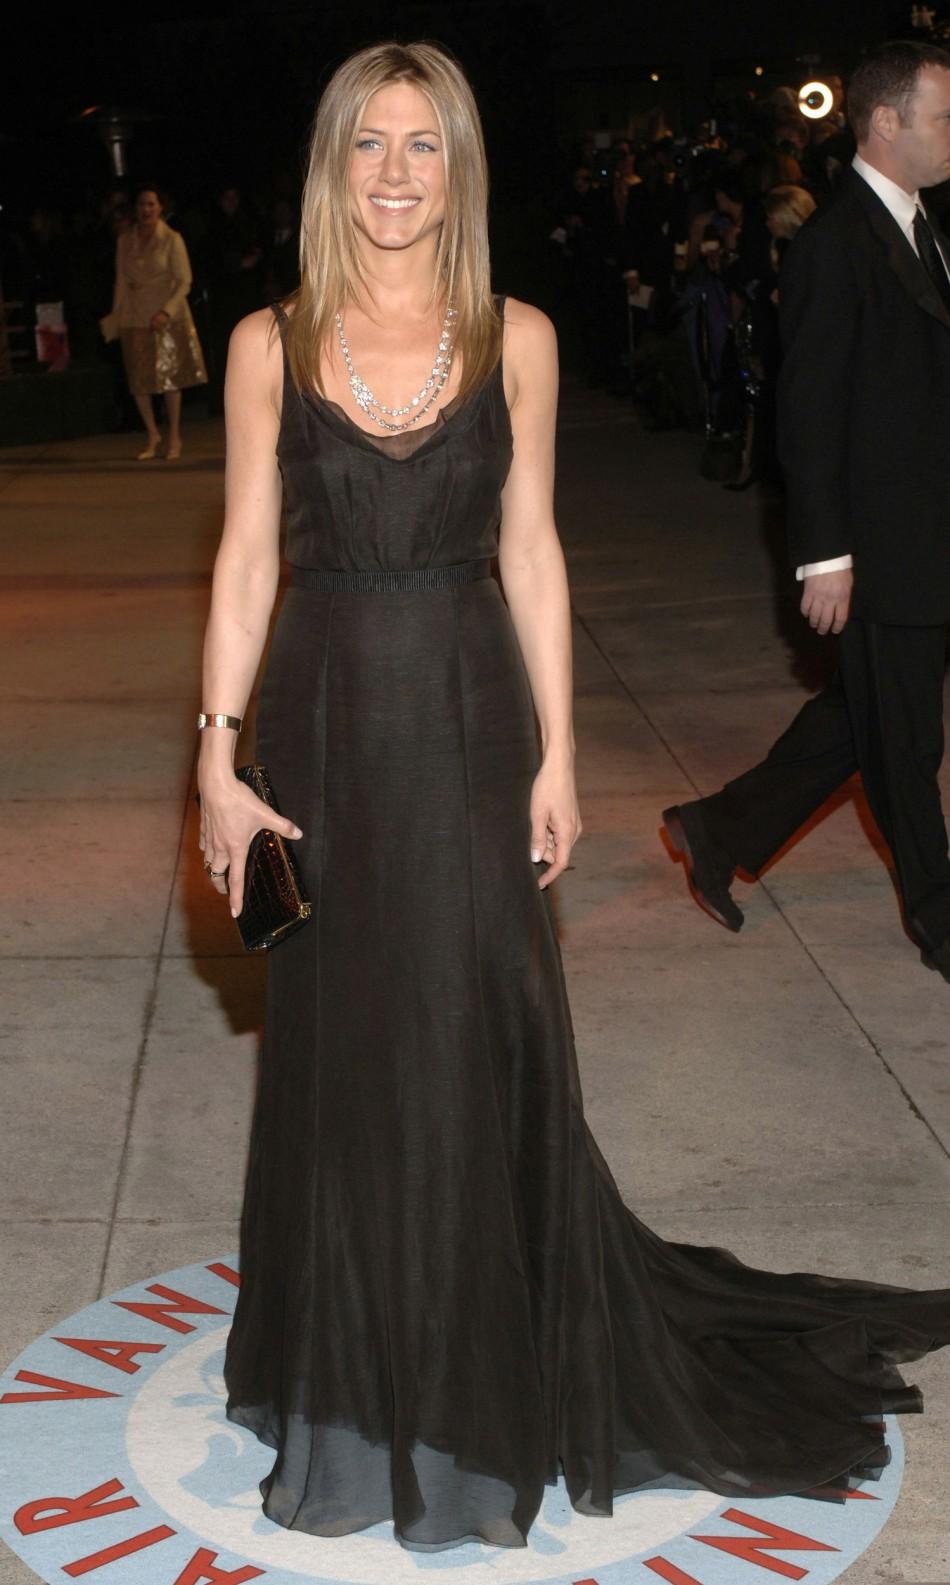 Actress Jennifer Aniston arrives at the Vanity Fair Oscar Party at Mortons